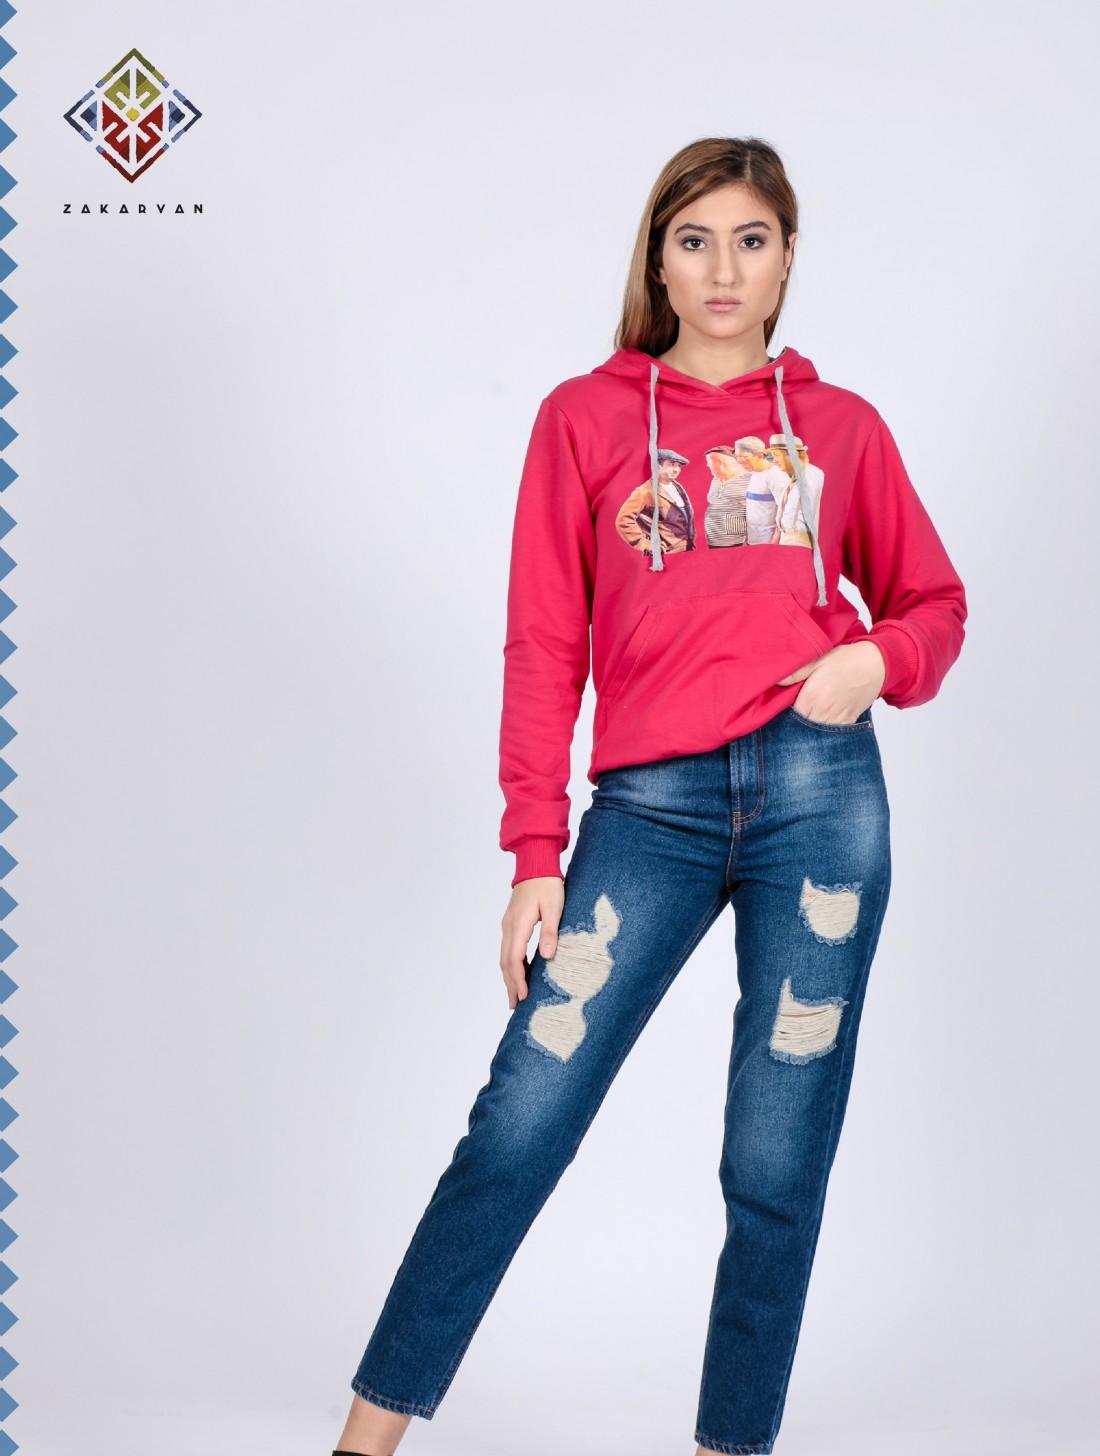 Lifehacks jeans